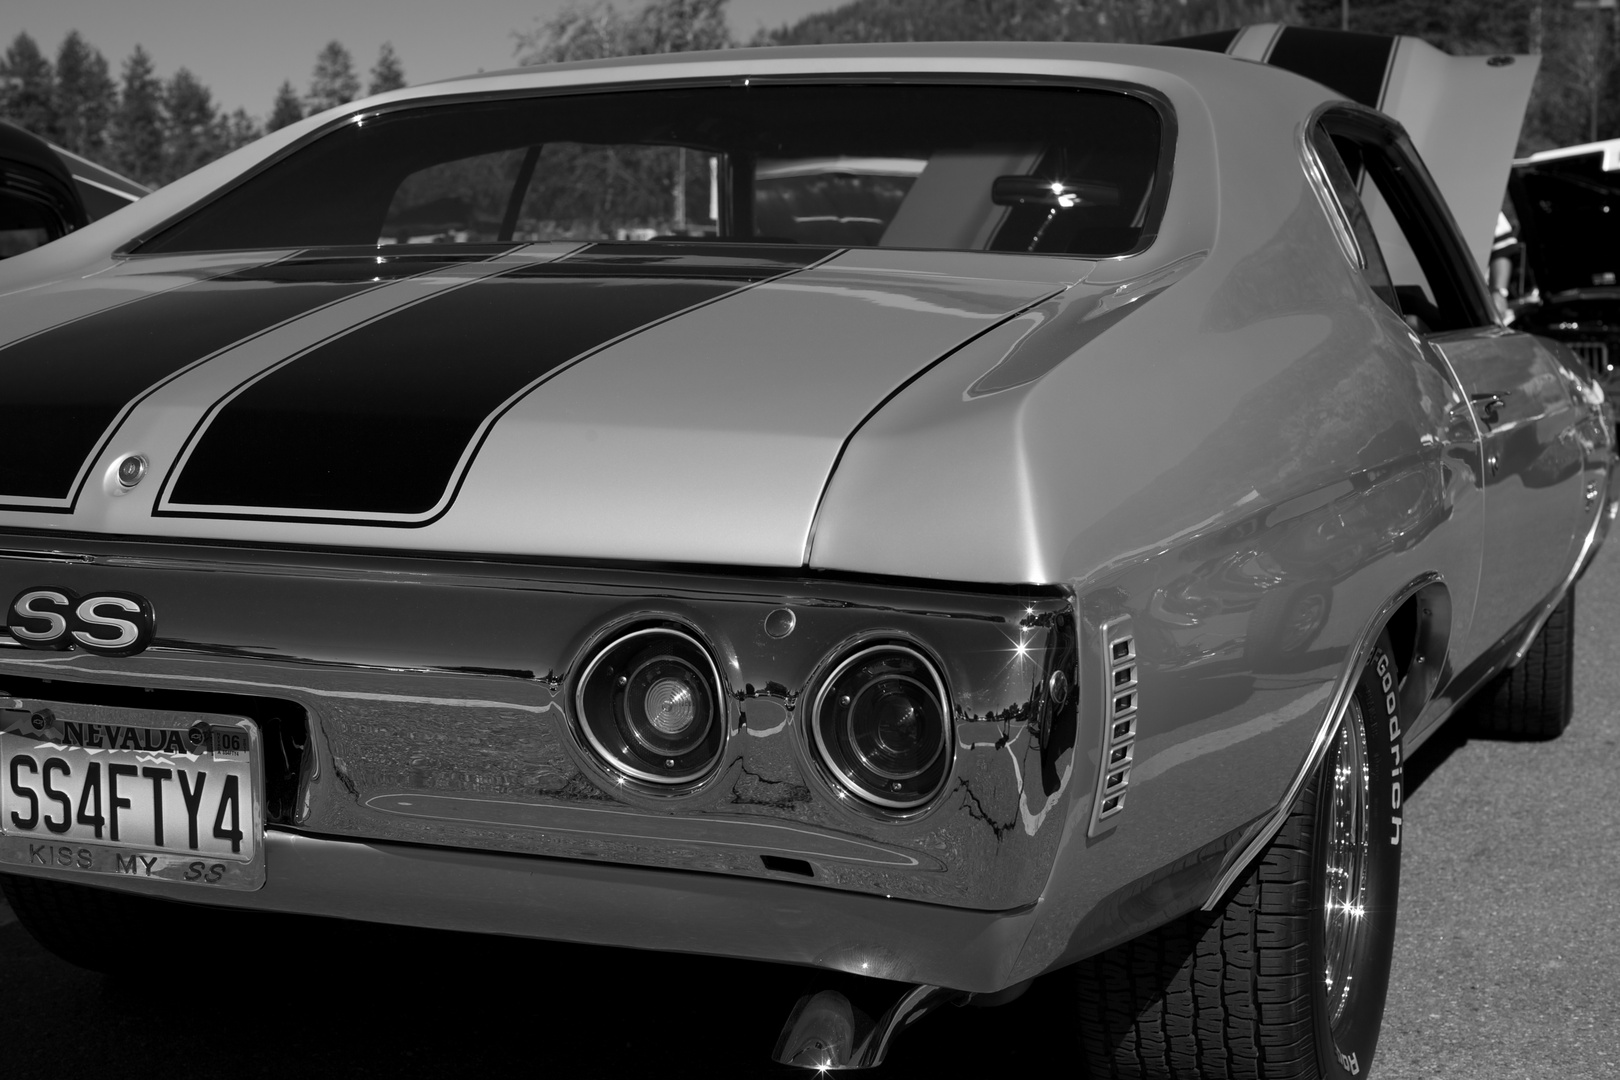 camaro ss the ultimate american muscle car foto & bild | autos